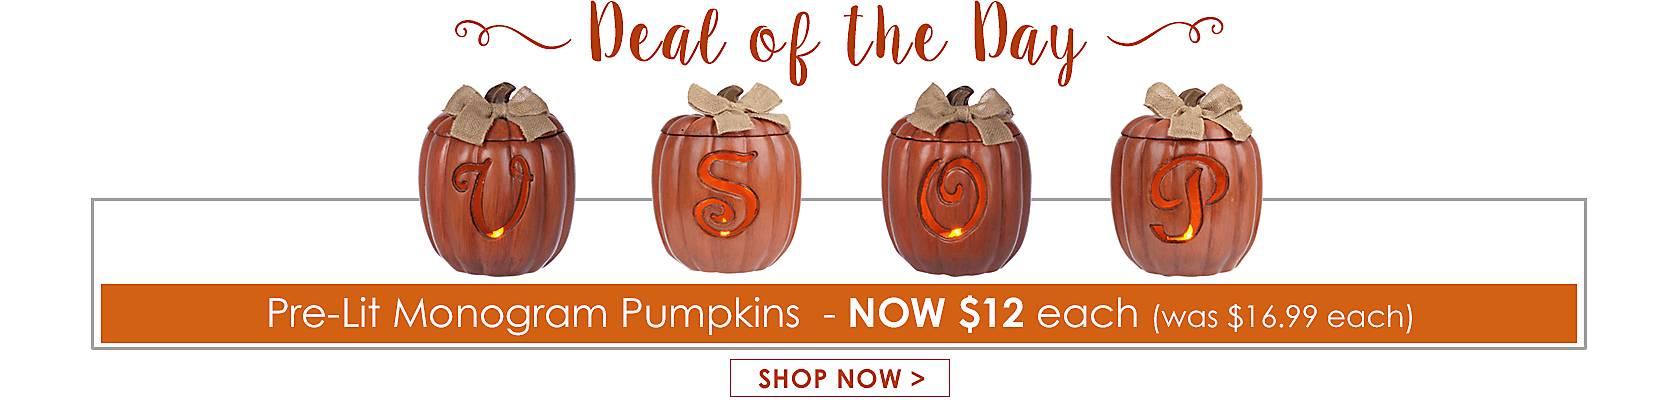 Deal of the Day -  Pre-Lit Monogram Pumpkins Now $12 - Shop Now